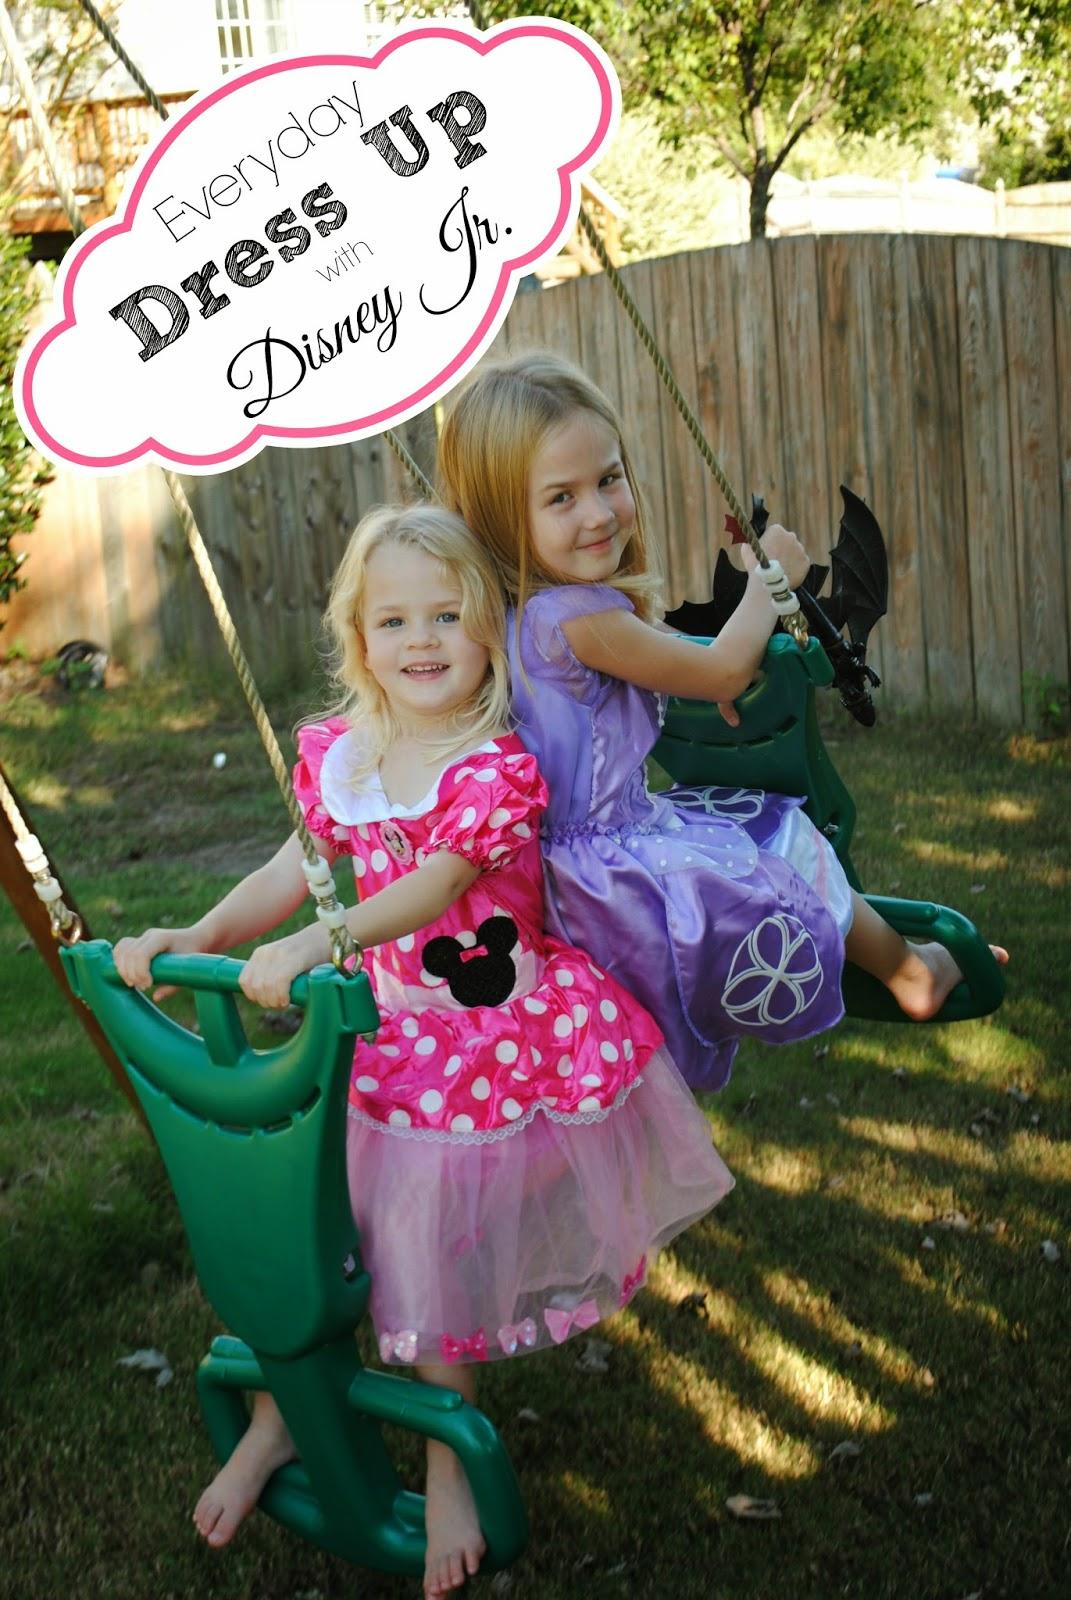 Everyday Dress Up with Disney Junior